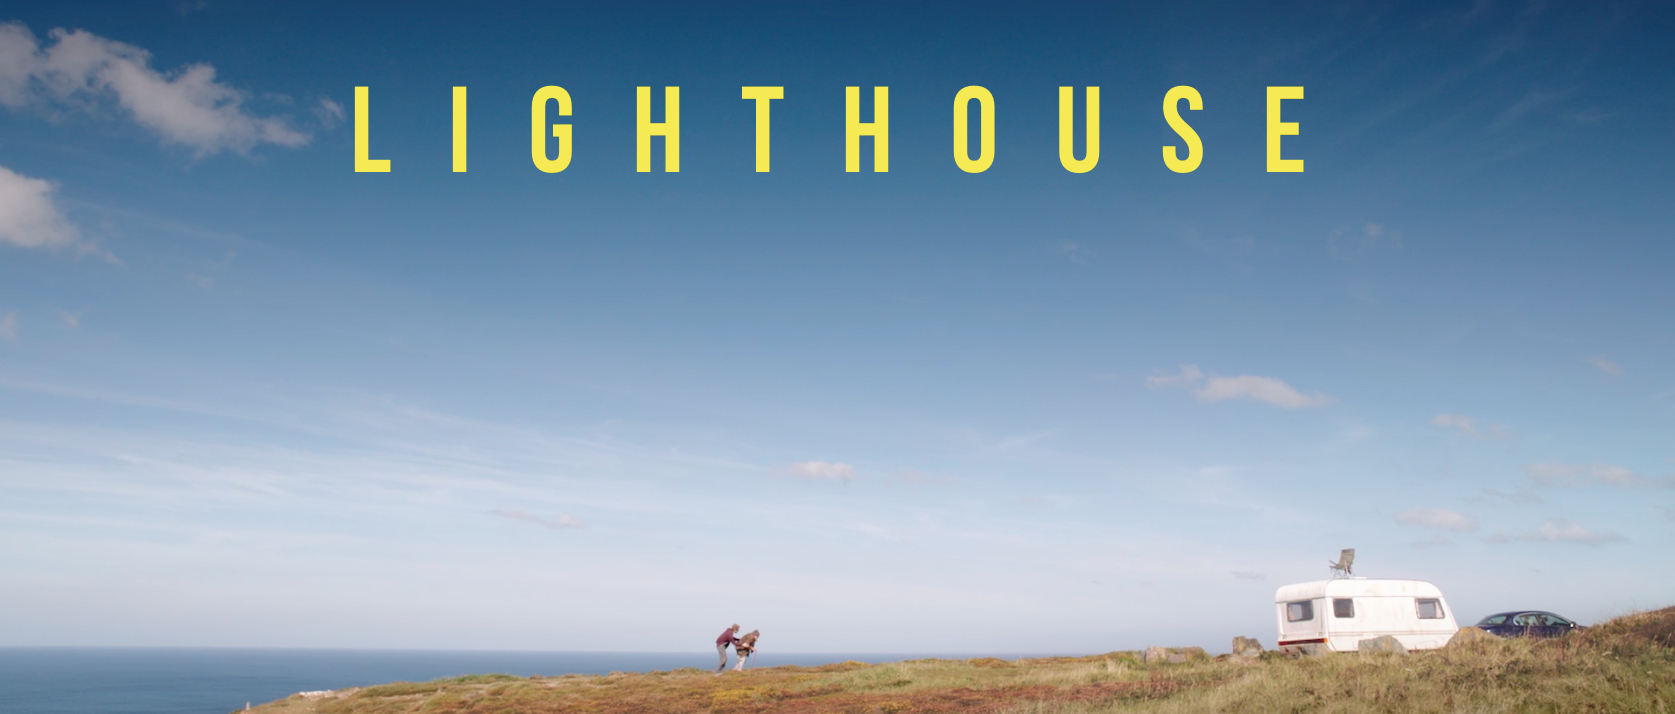 Lighthouse title.jpg